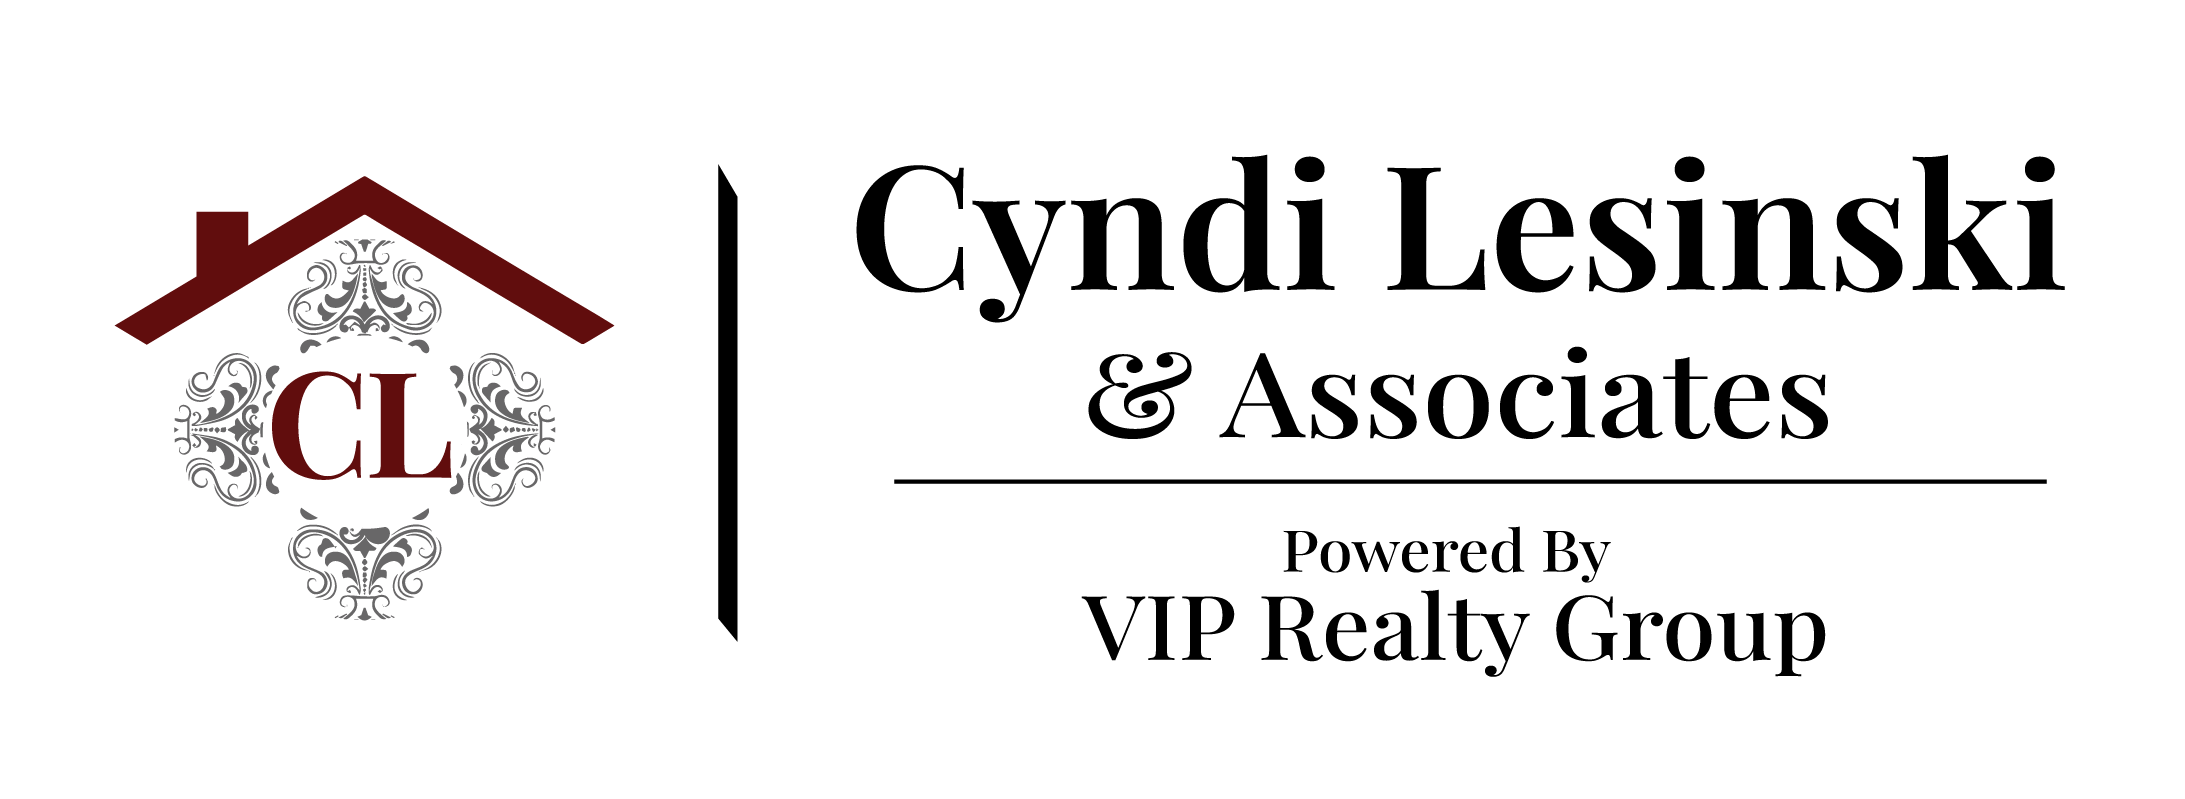 burgundy CL- transparent